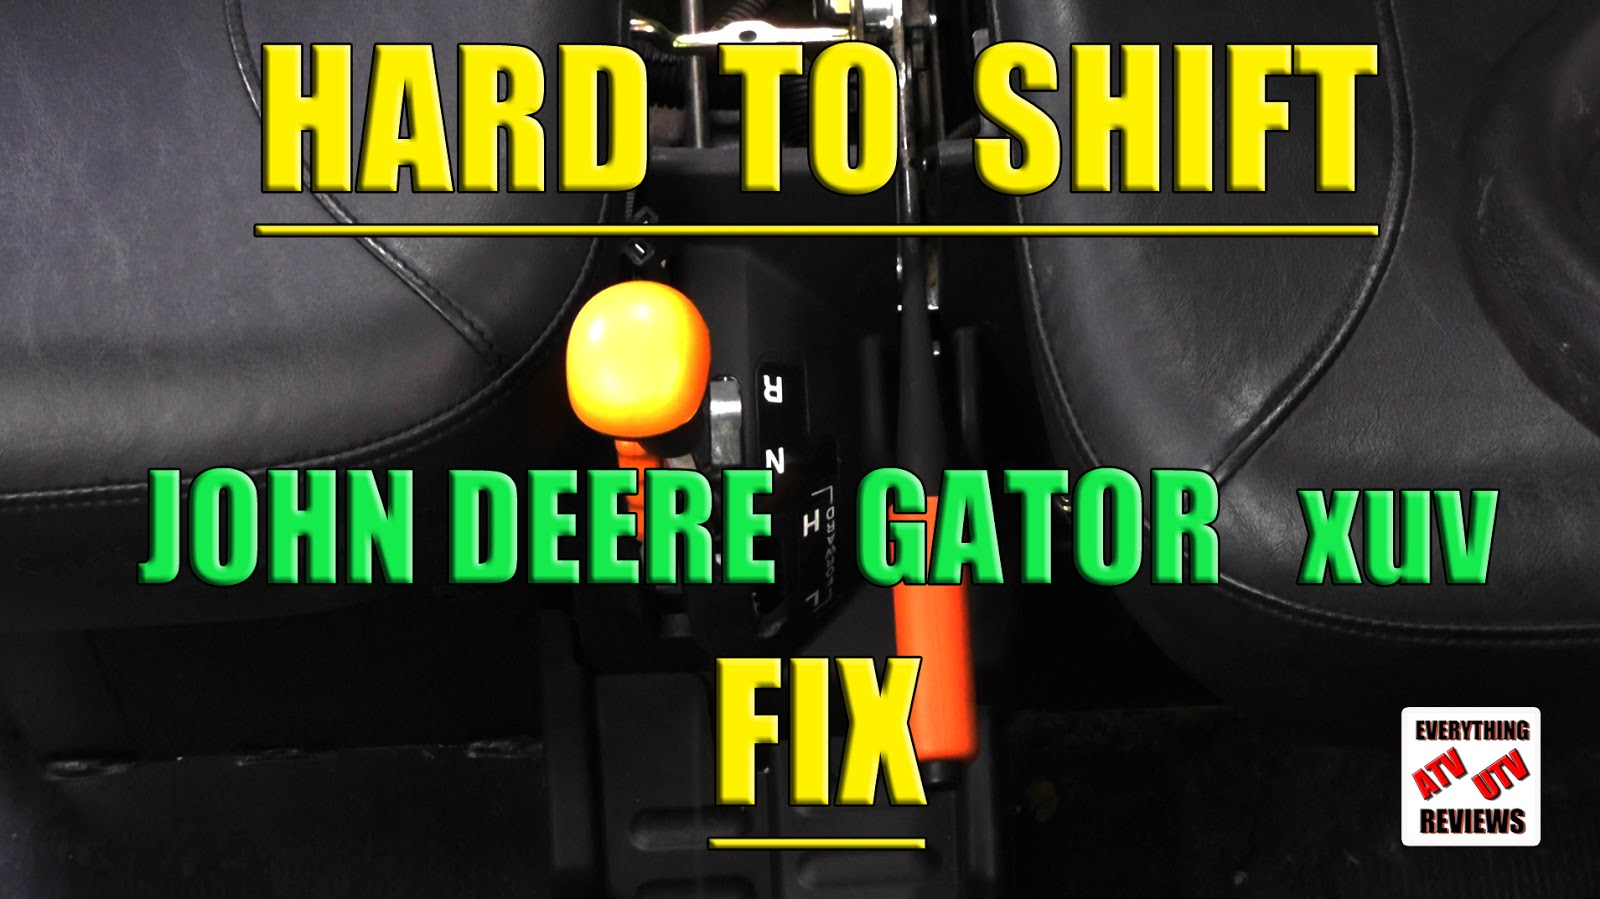 2013 John Deere Gator 855d Wiring Diagram 5200 Everything Atv Utv Reviews